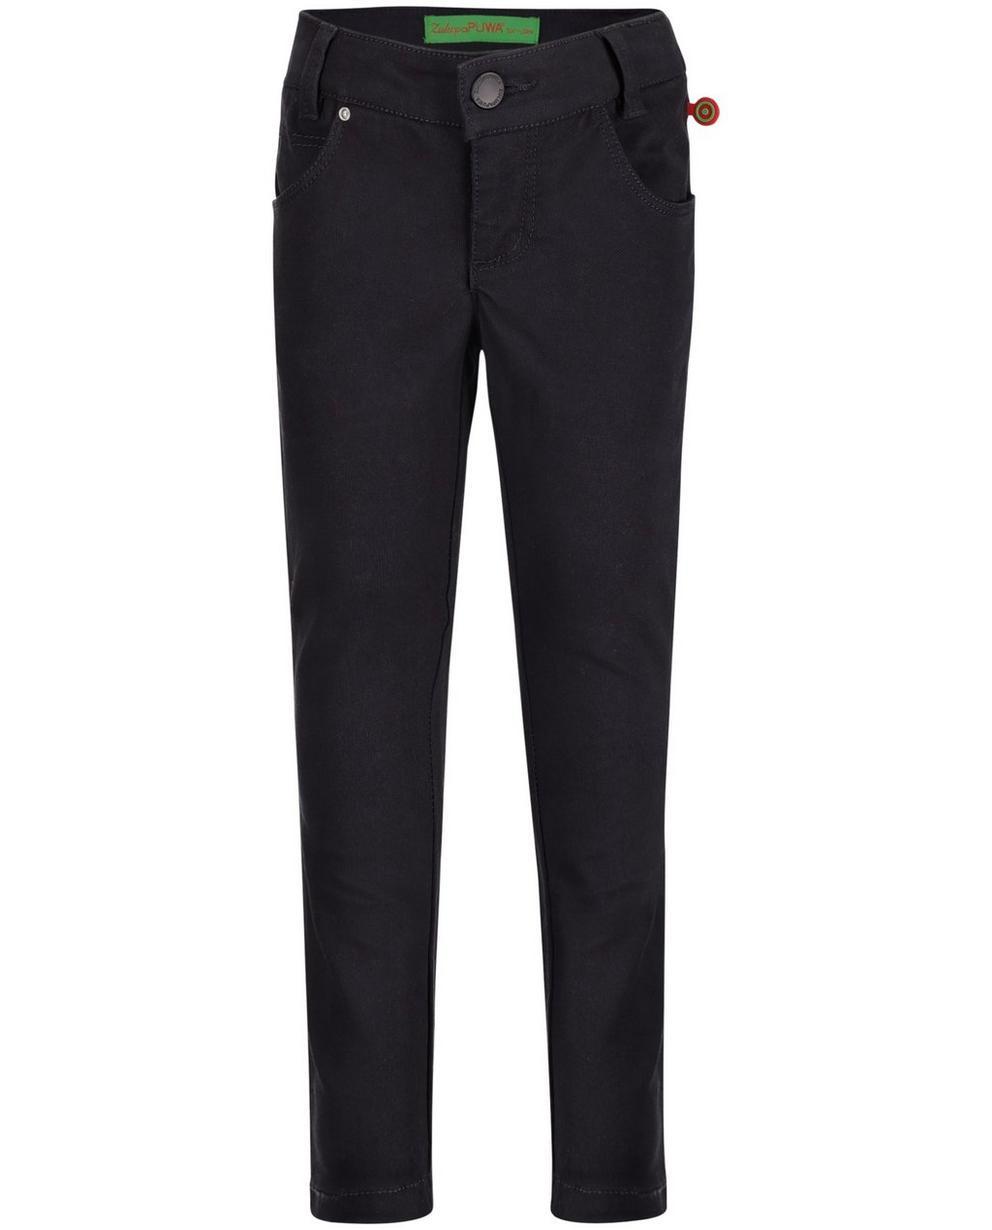 Pantalons - dark grey -